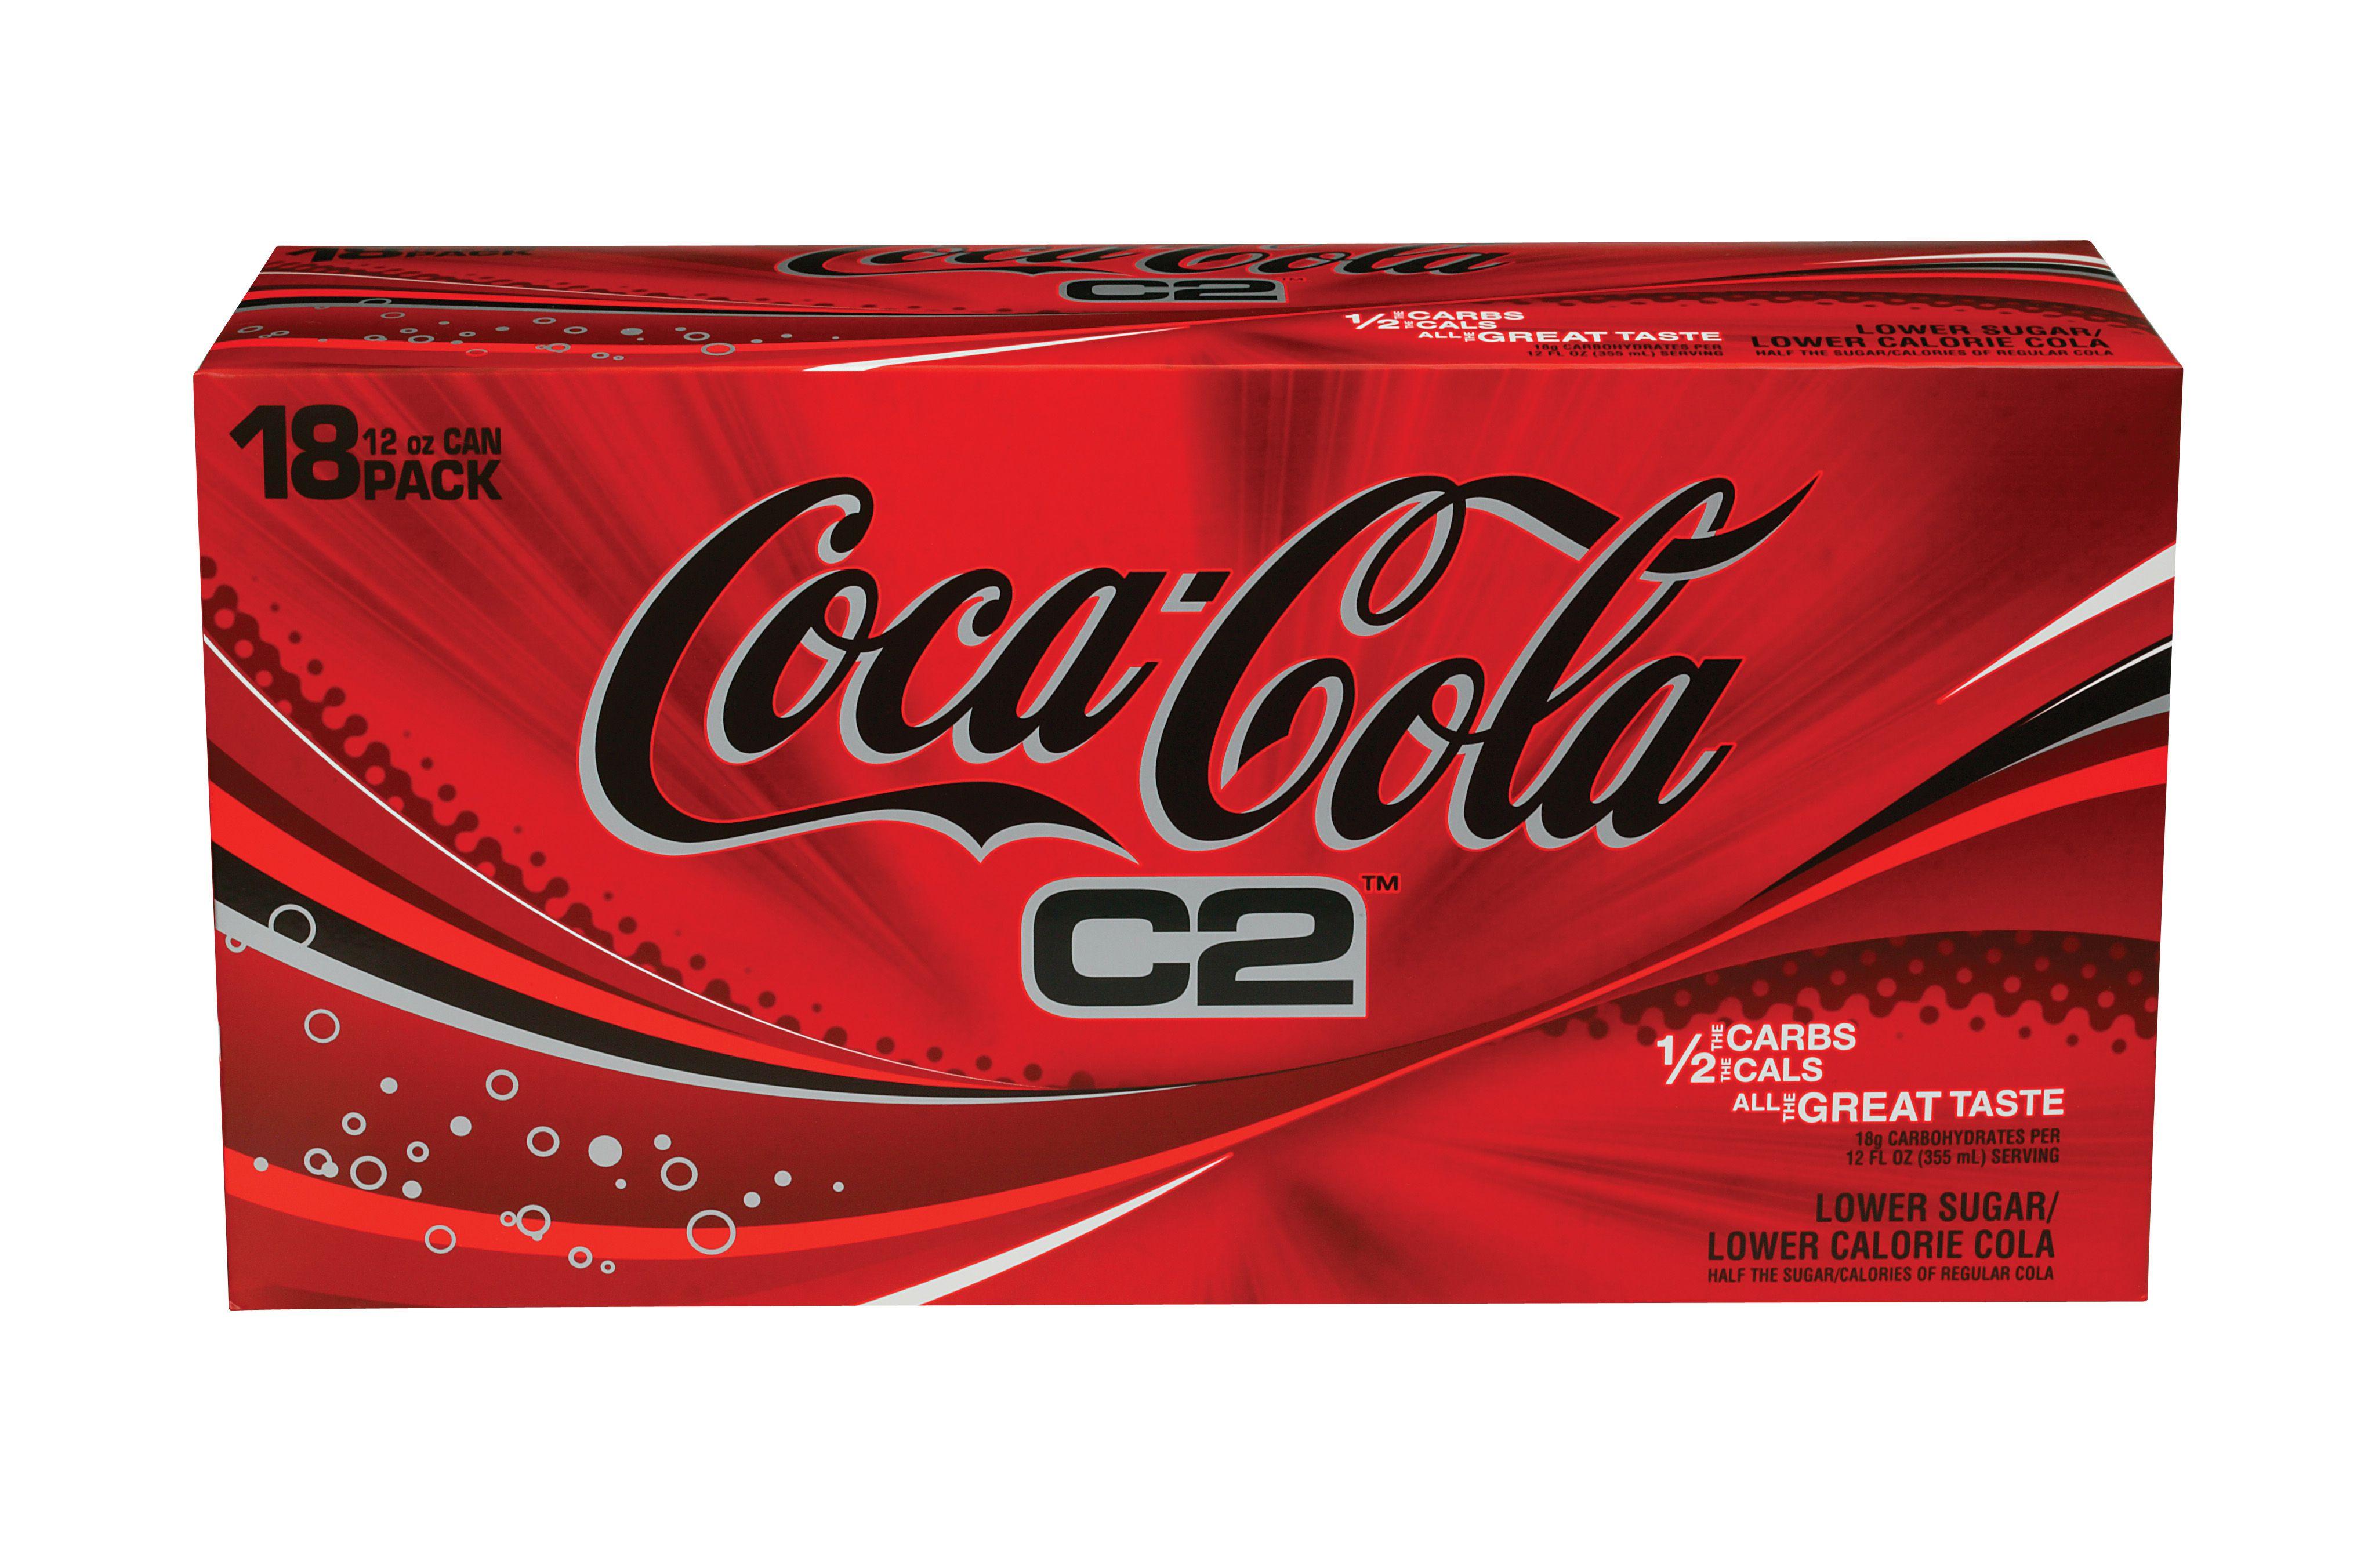 Coca Cola Company C2 Packaging